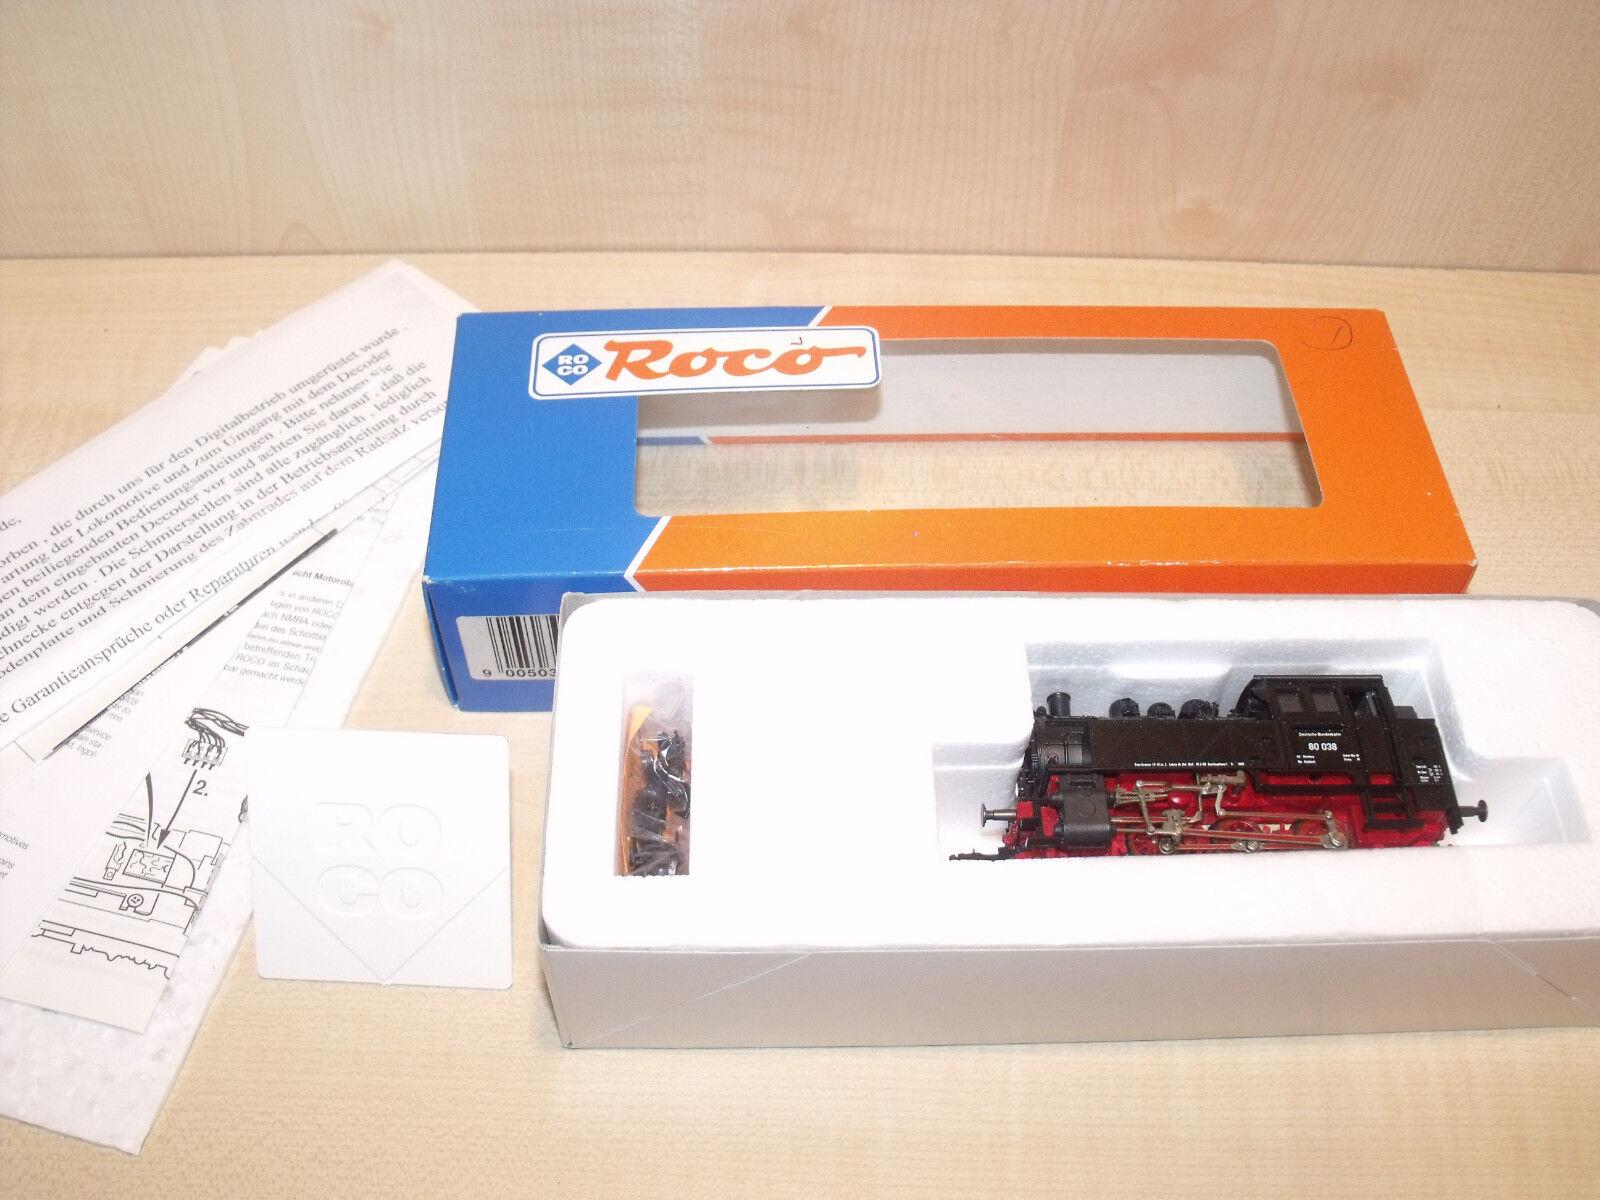 103) ROCO - DAMPFLOK DAMPFLOK DAMPFLOK BR 80 038 DIGITAL m. MotGoldla - OK  | Neue Produkte im Jahr 2019  68c83f